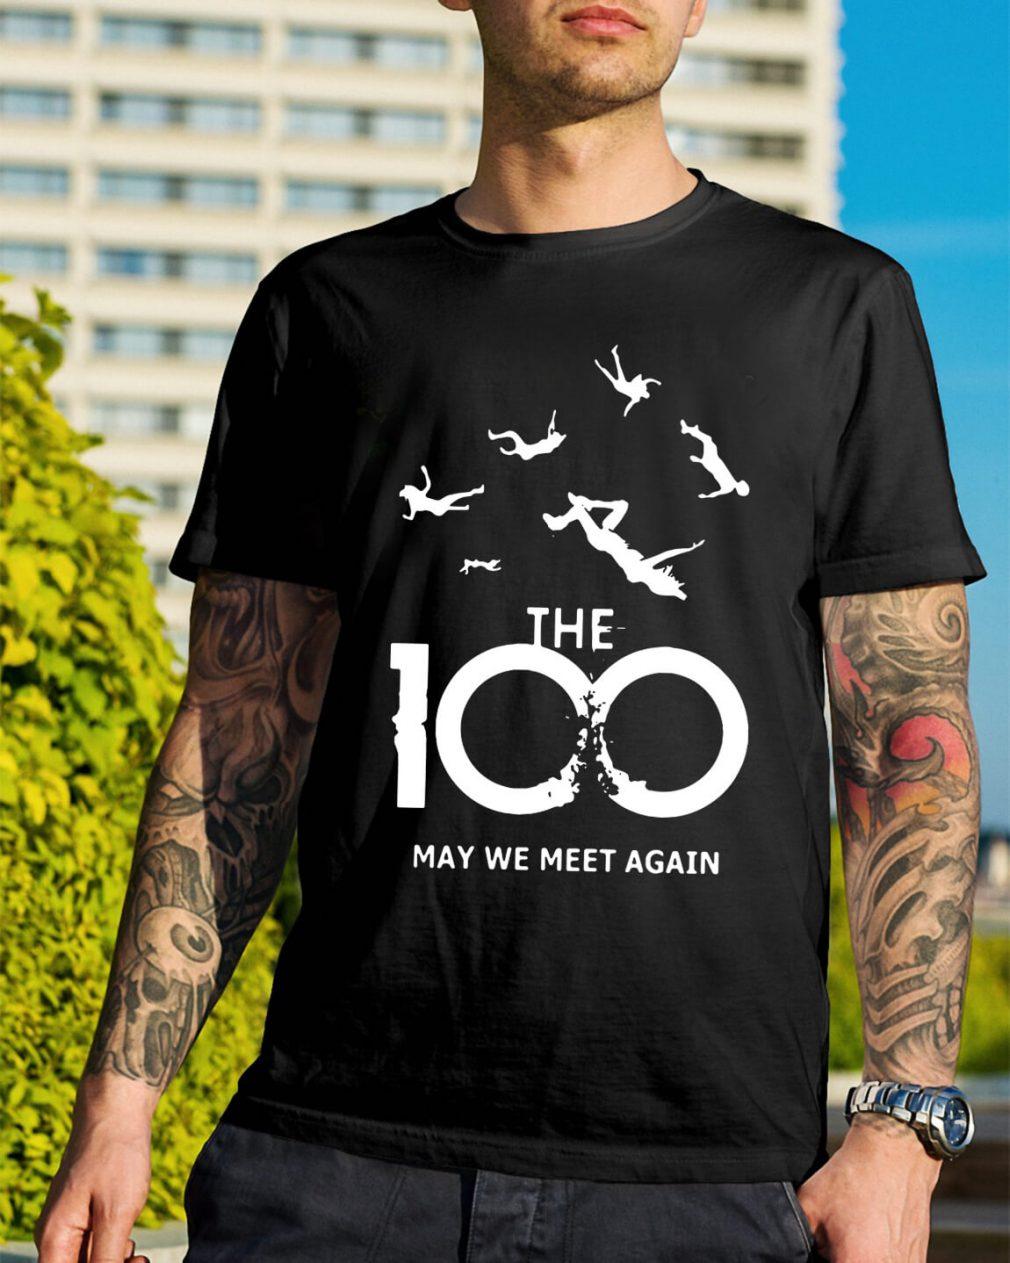 The 100 may we meet again shirt